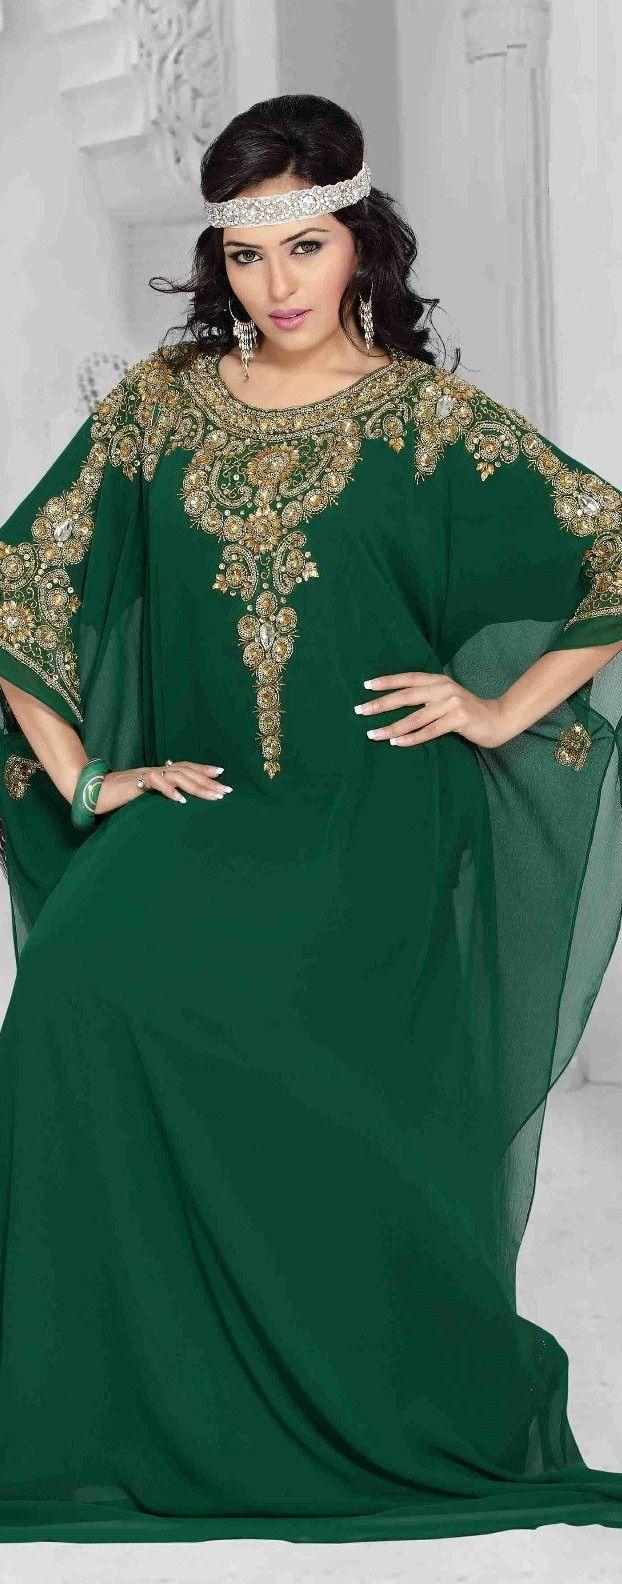 Dubai style kaftan caftan style pinterest kaftan and caftans